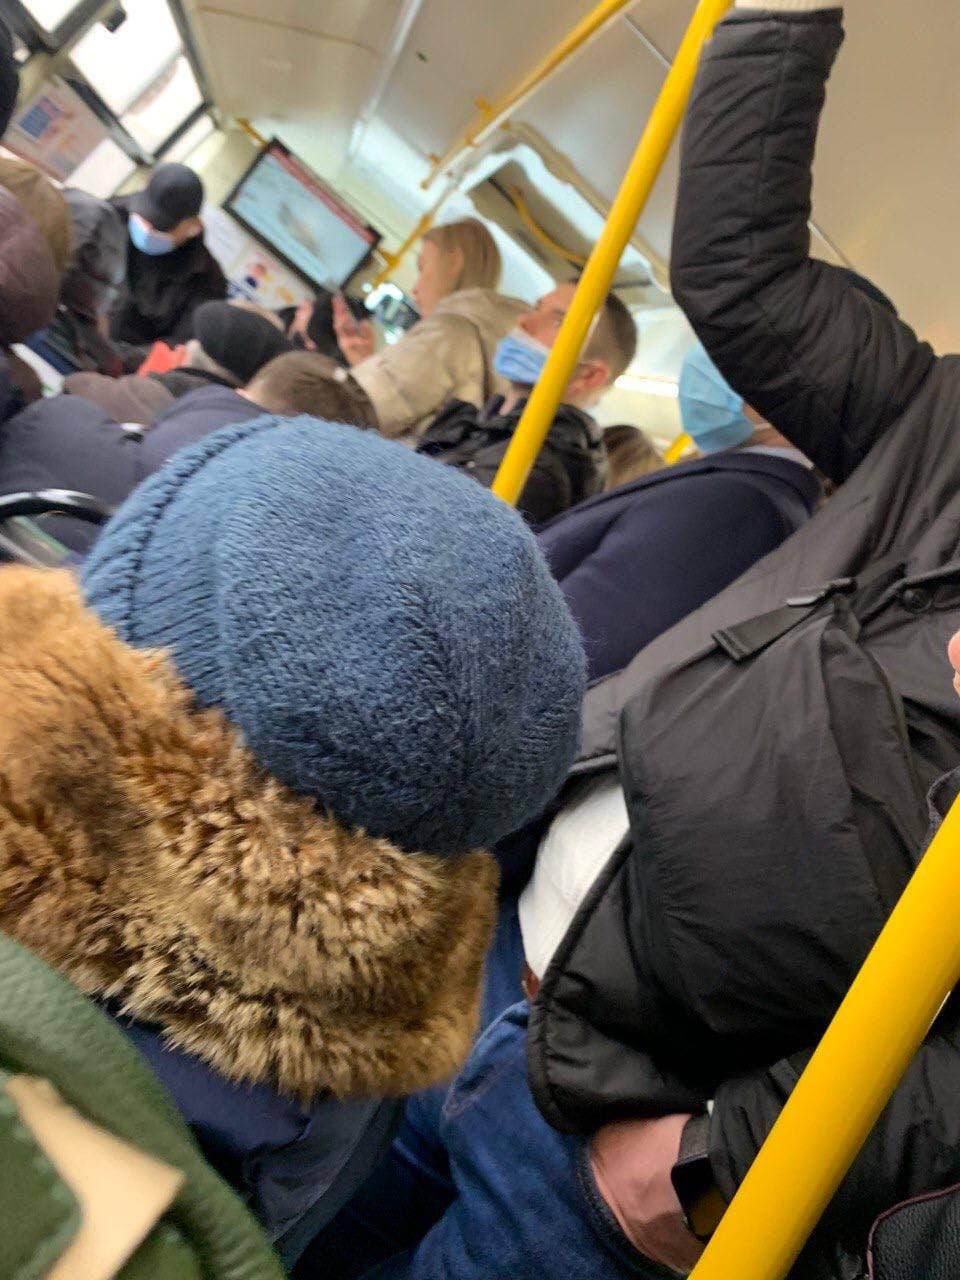 В Киеве, несмотря на карантин, транспорт переполнен